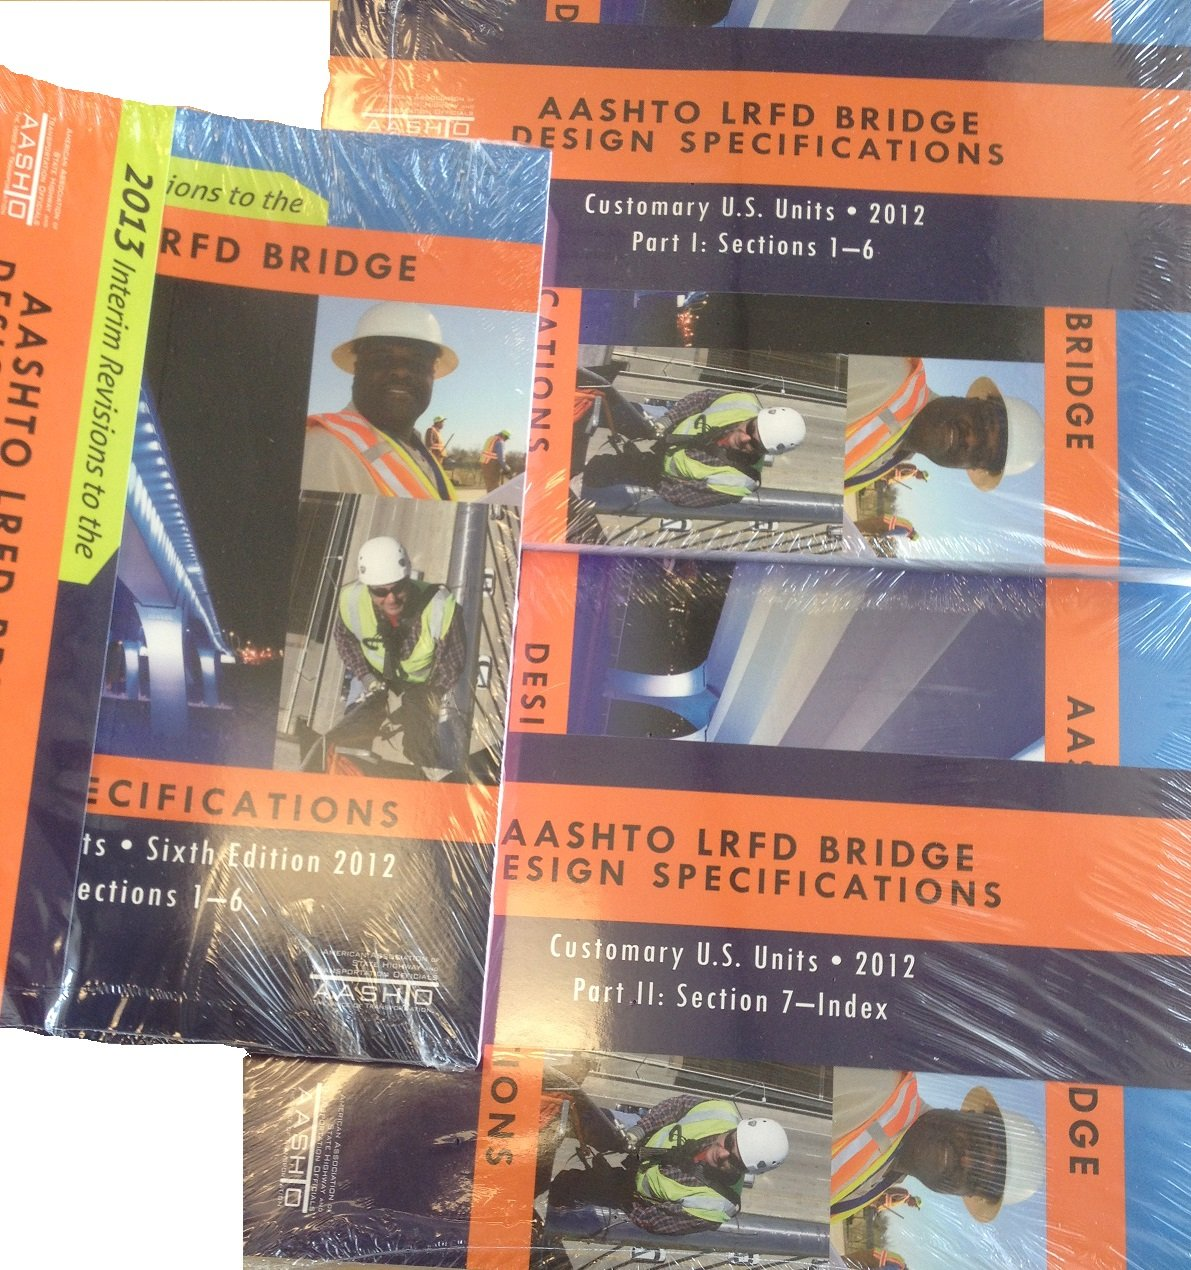 AASHTO LRFD Bridge Design Specifications, 6th Edition